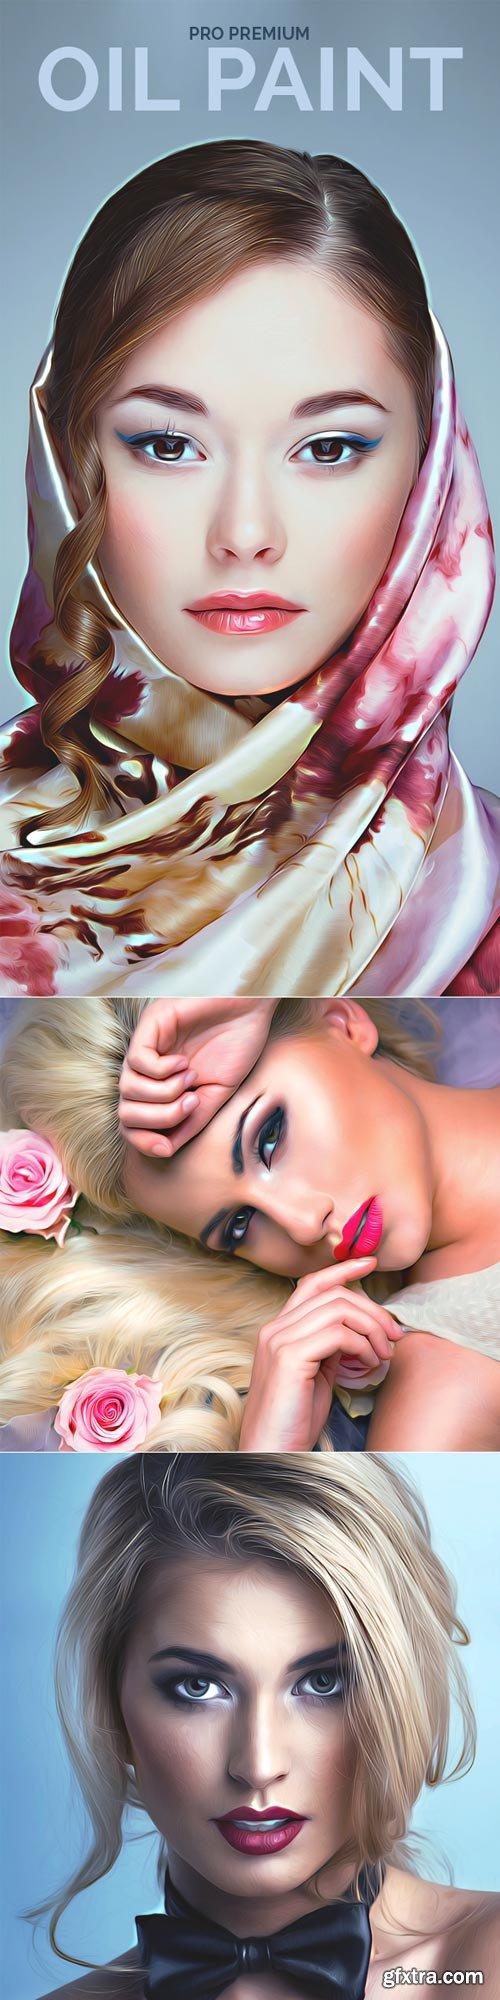 GraphicRiver - Pro Premium Oil Paint - 22065775